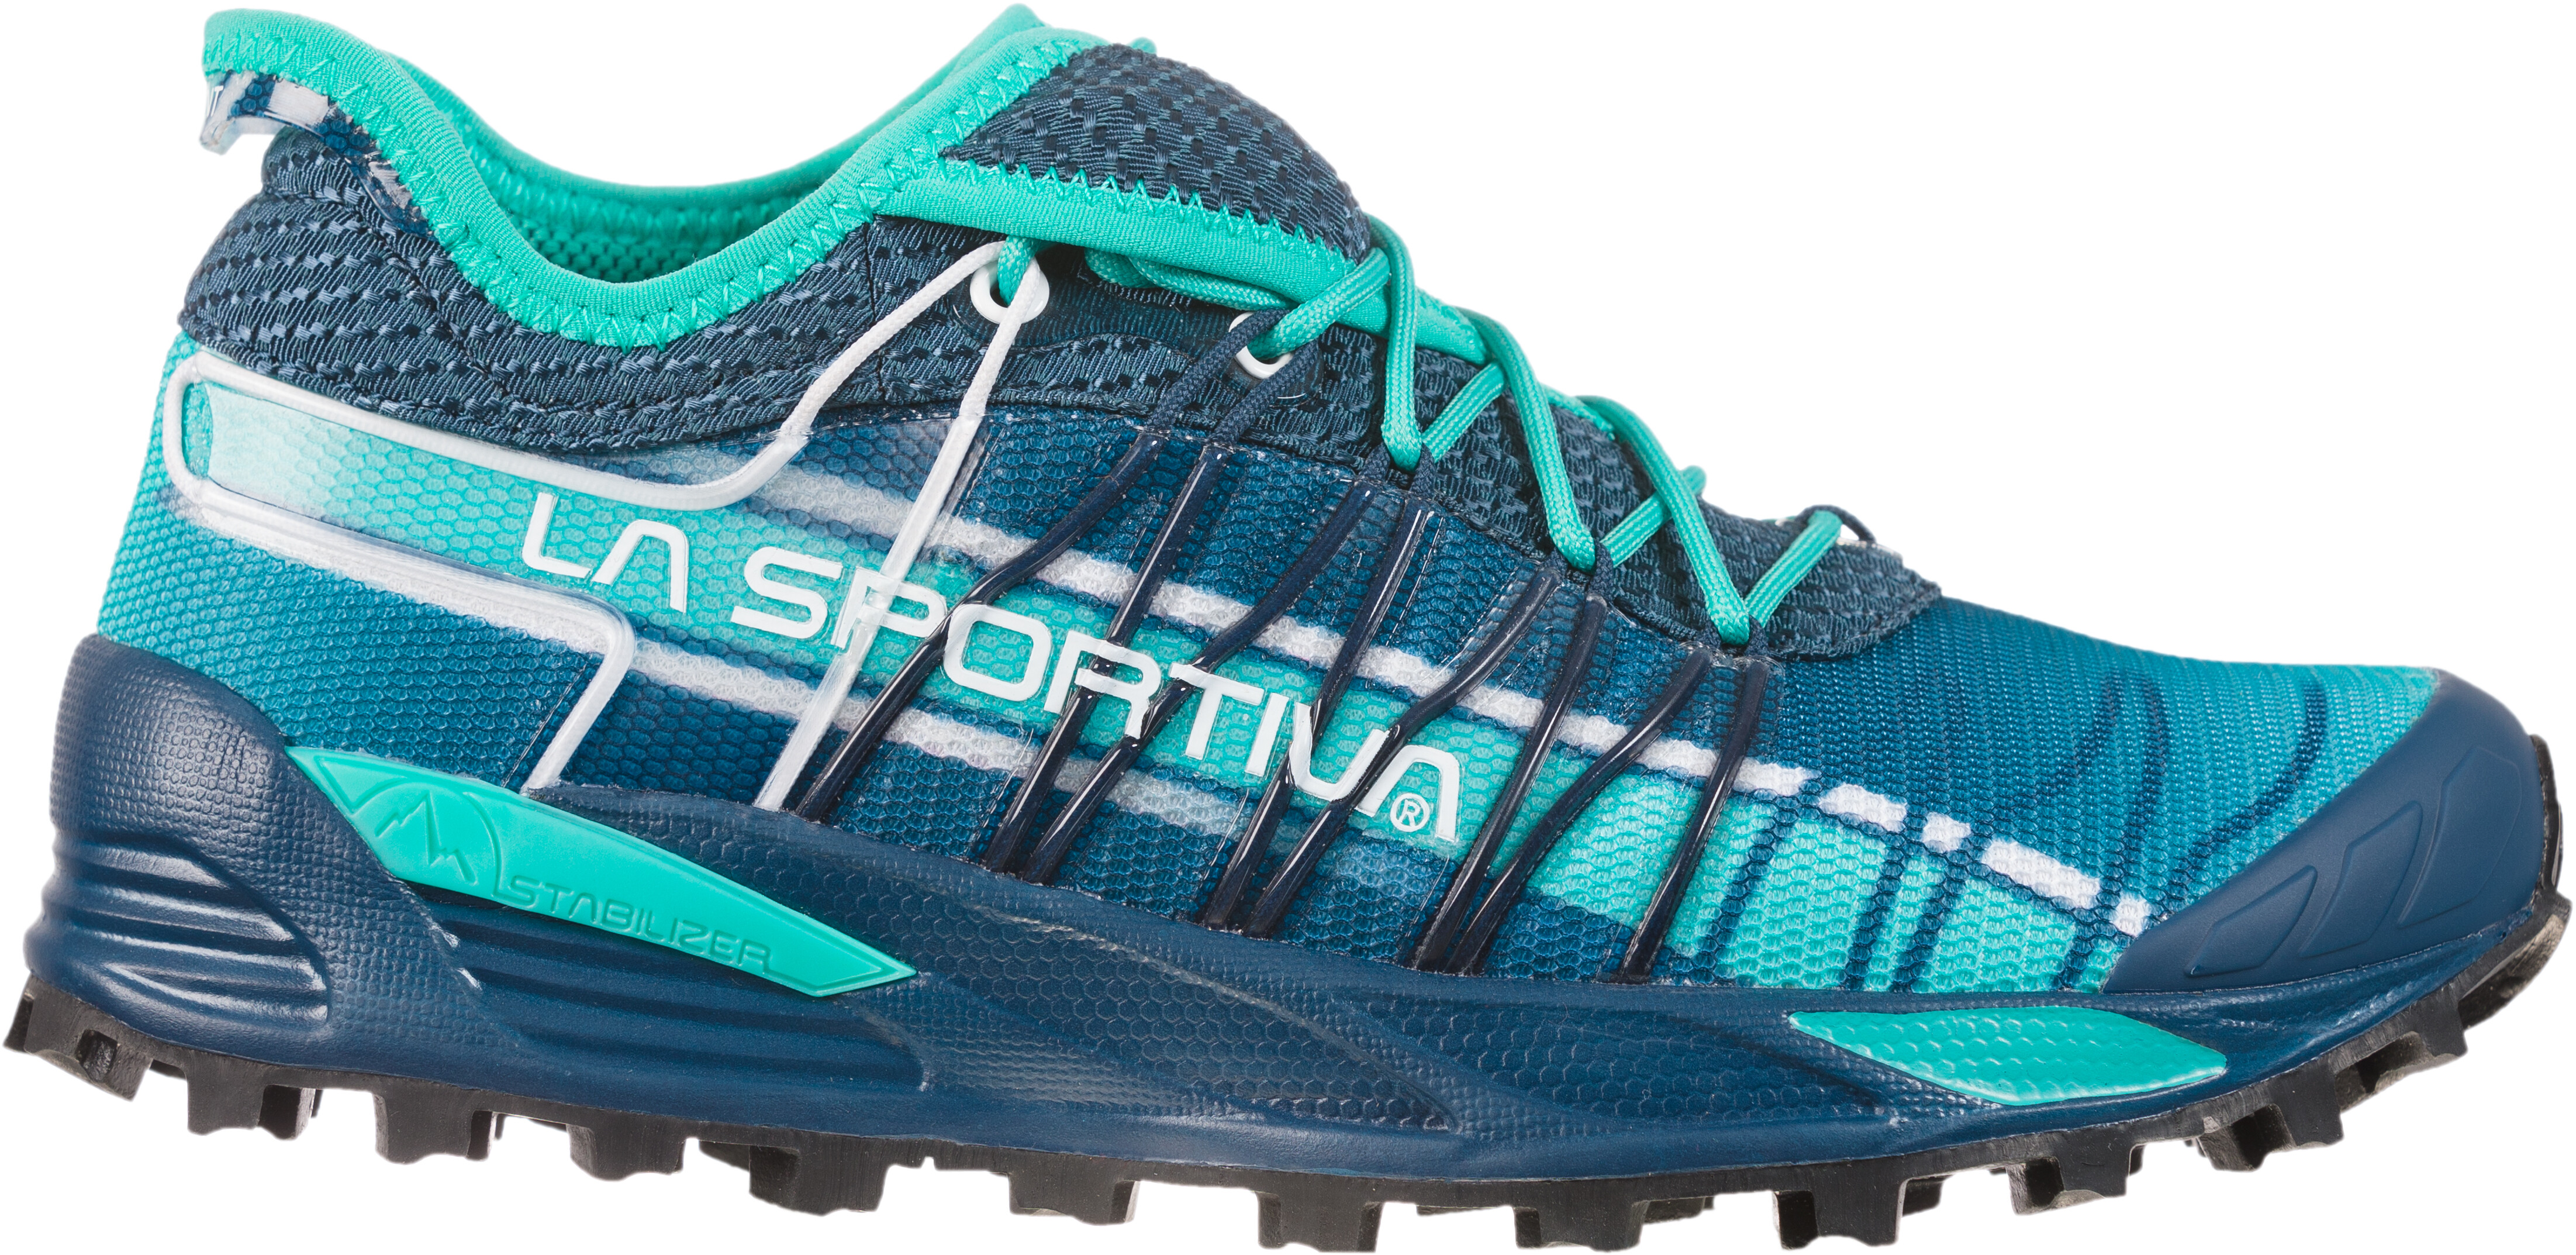 5a1bde52b2c5 La Sportiva Mutant scarpe da corsa Donna, opal/aqua su Addnature